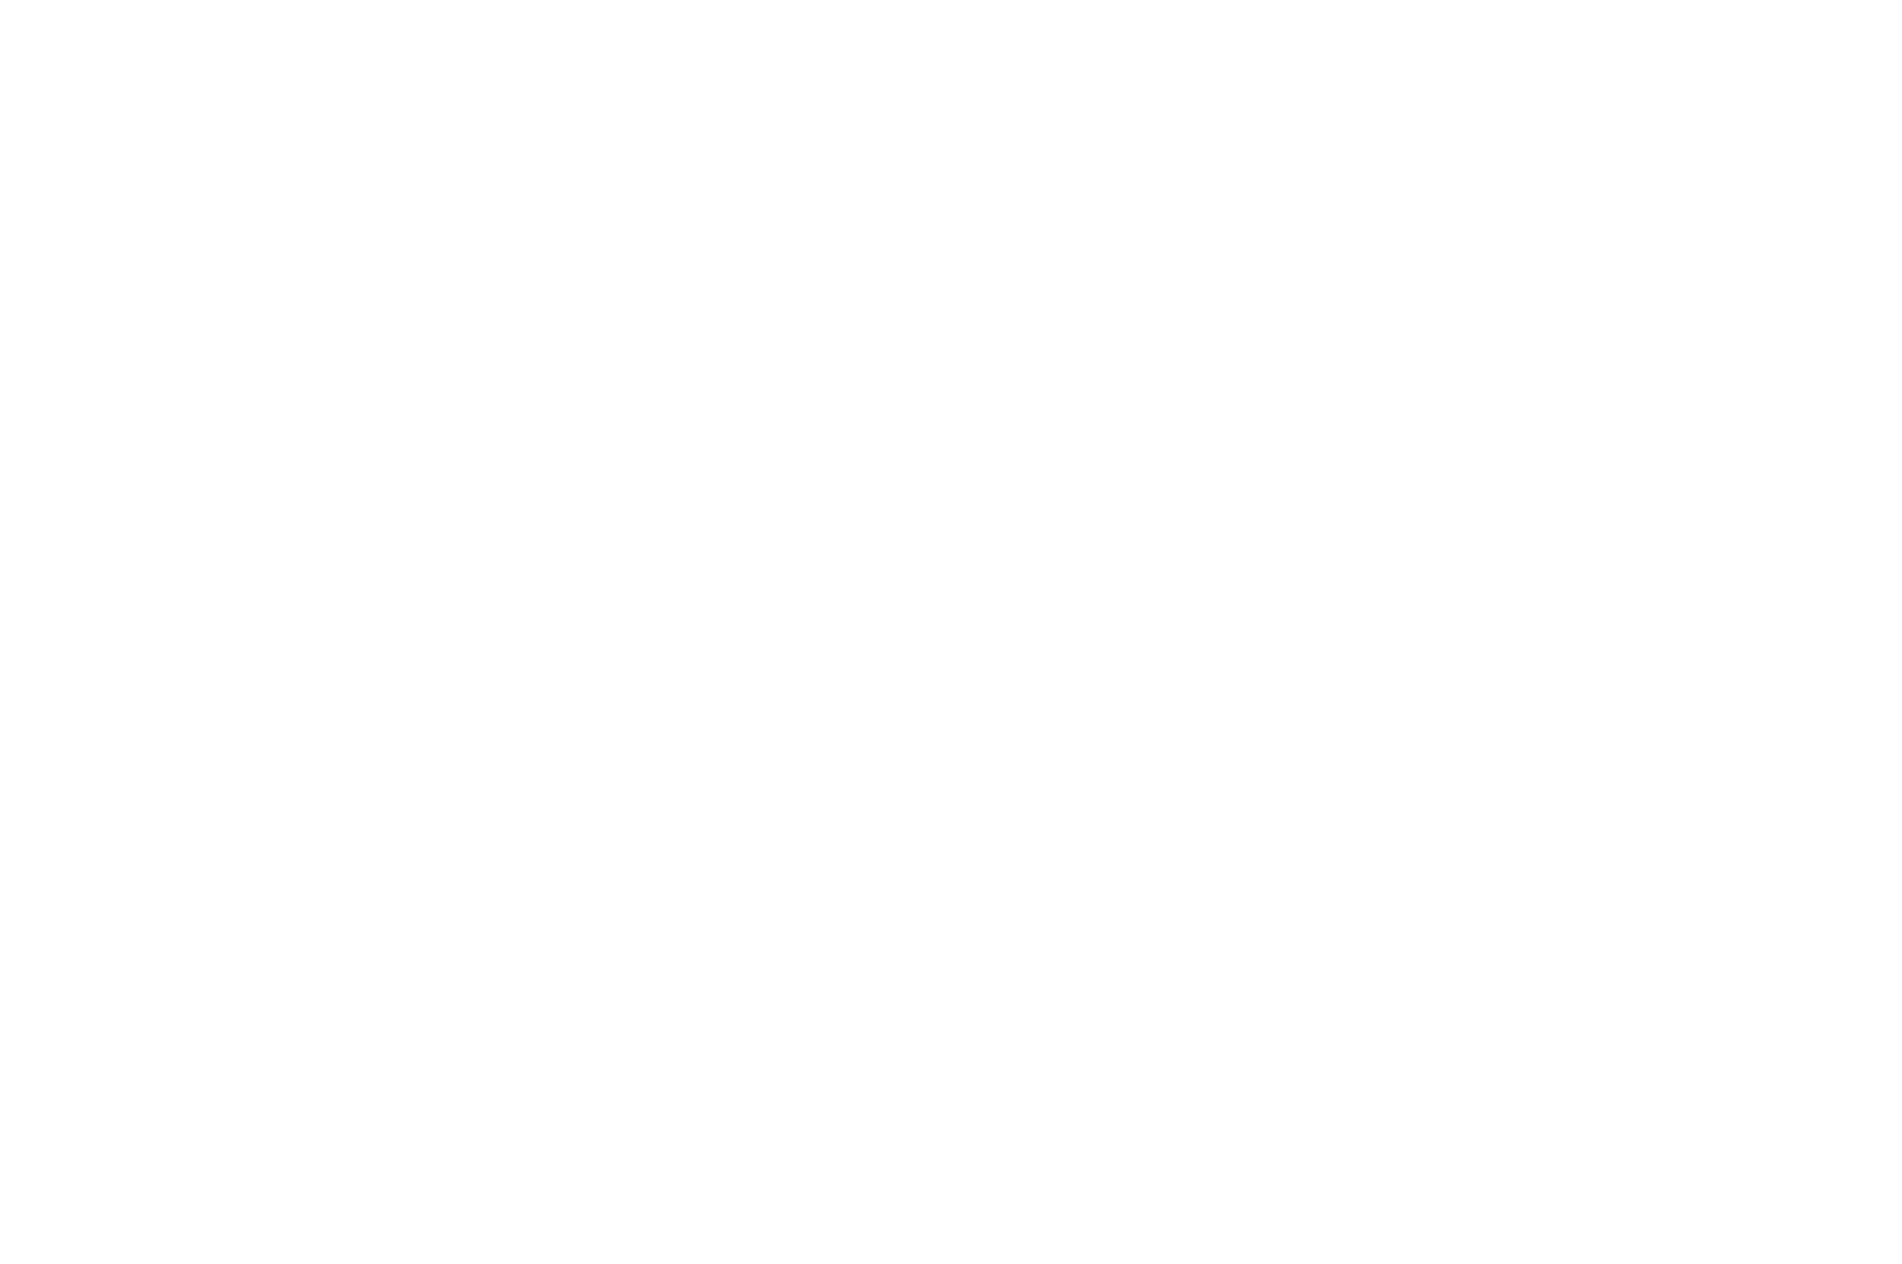 Vacine.me